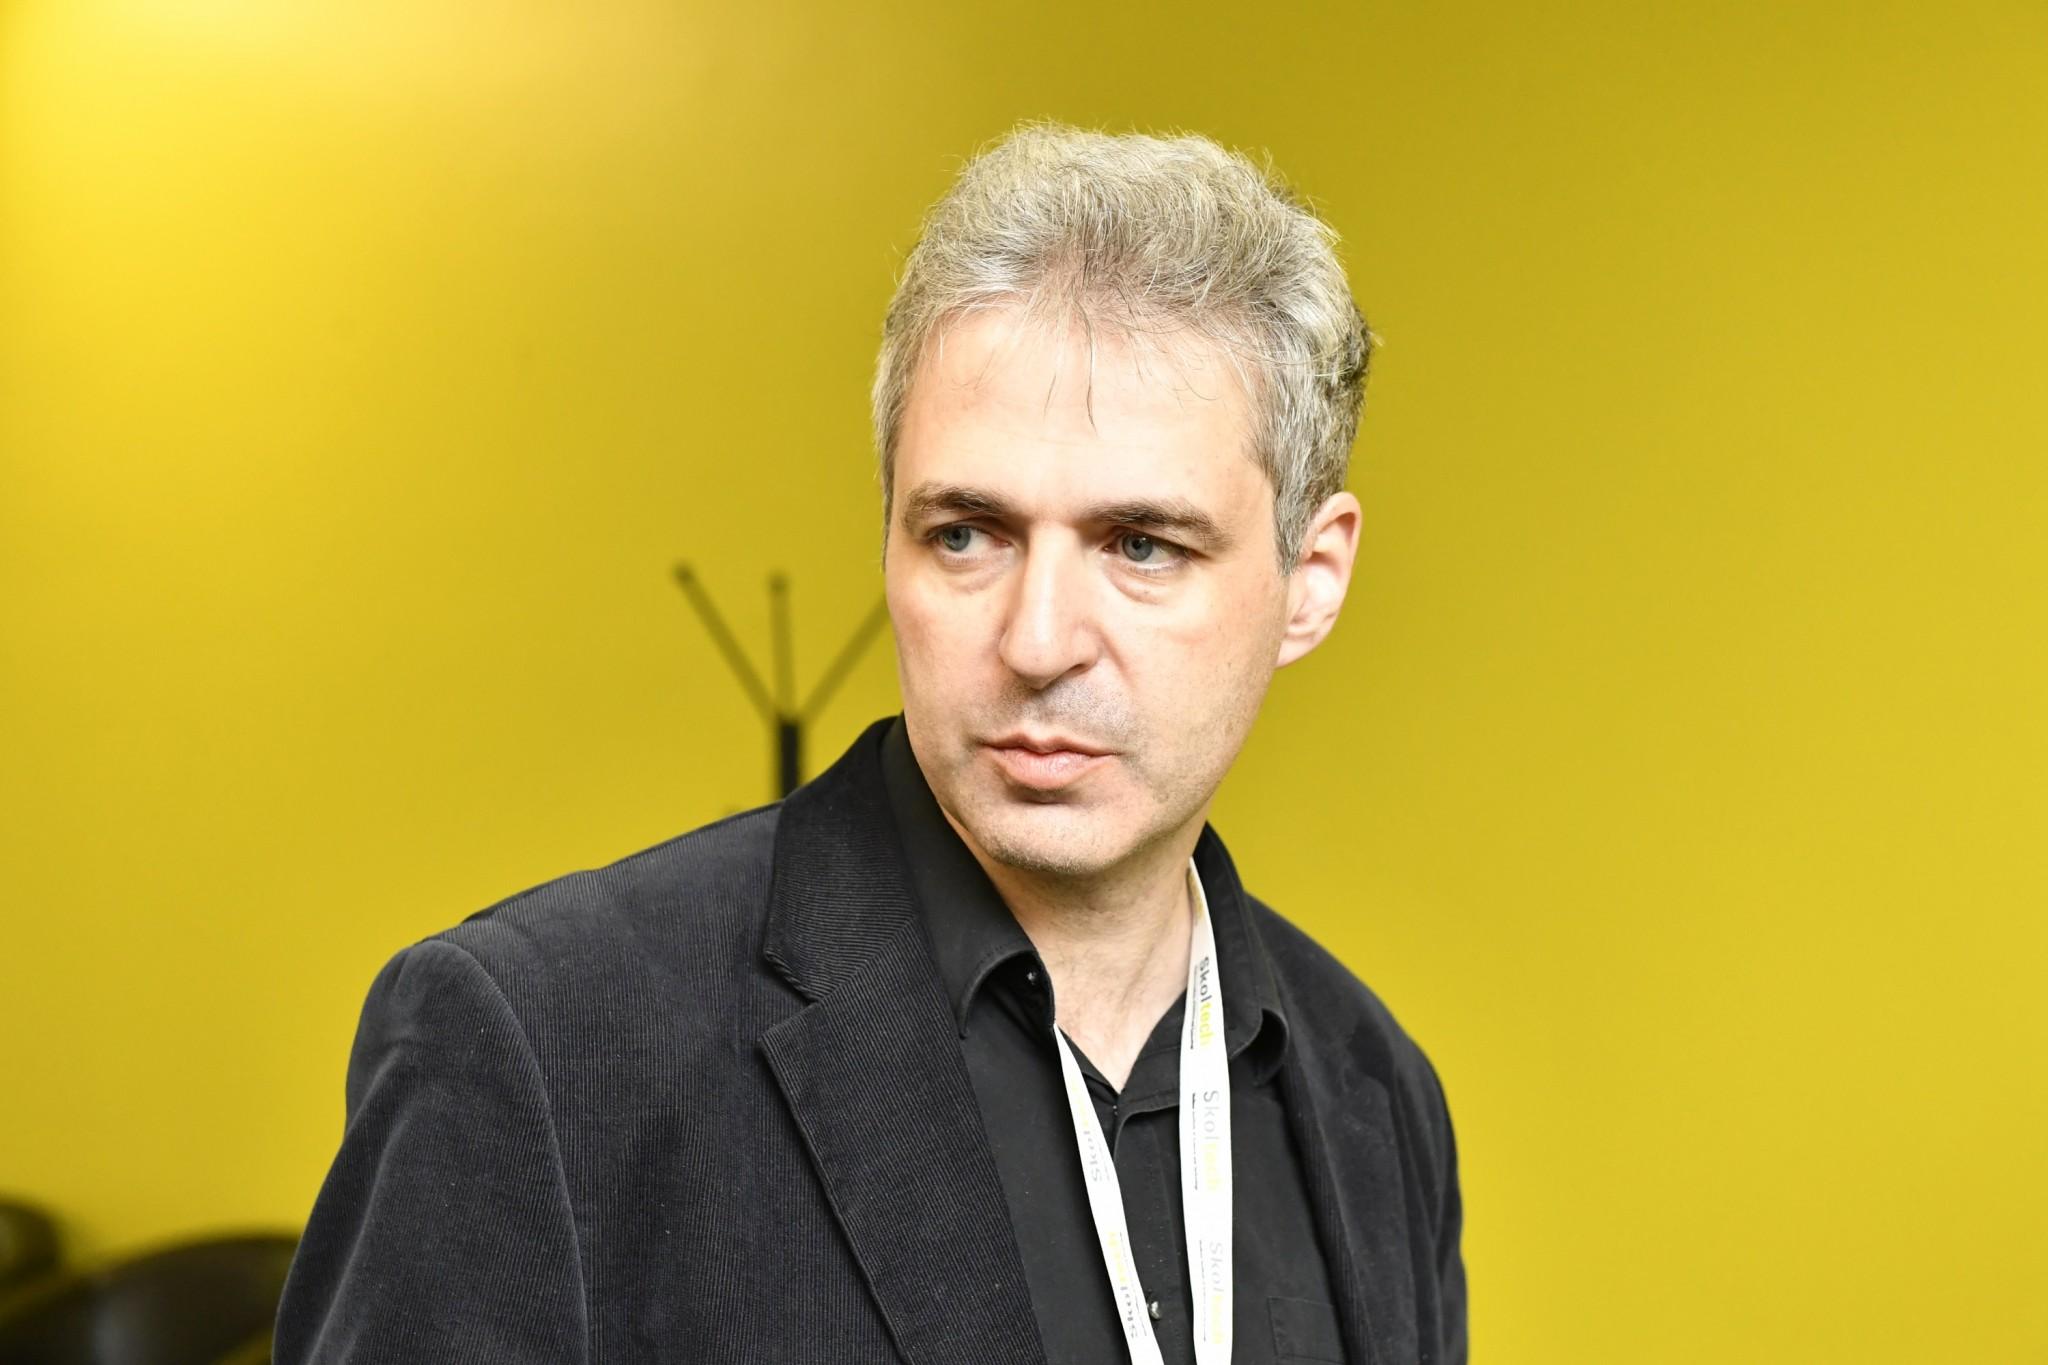 Skoltech Professor Boris Fine. Photo: Skoltech.